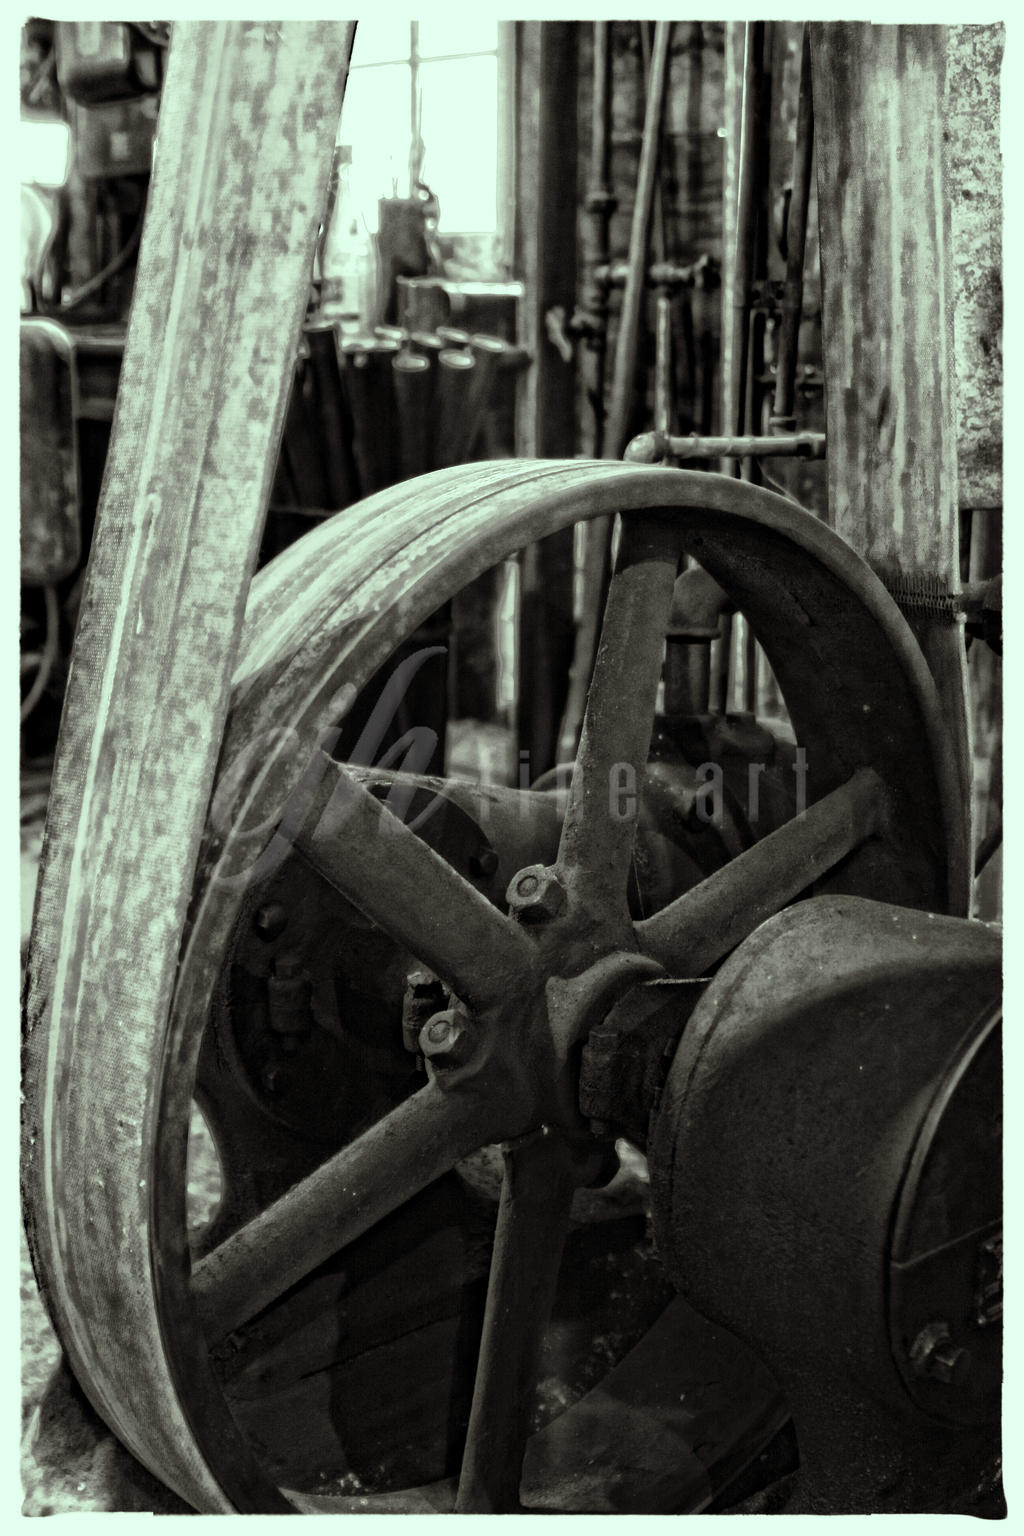 Abandoned Machine Shop - Convey by cjheery